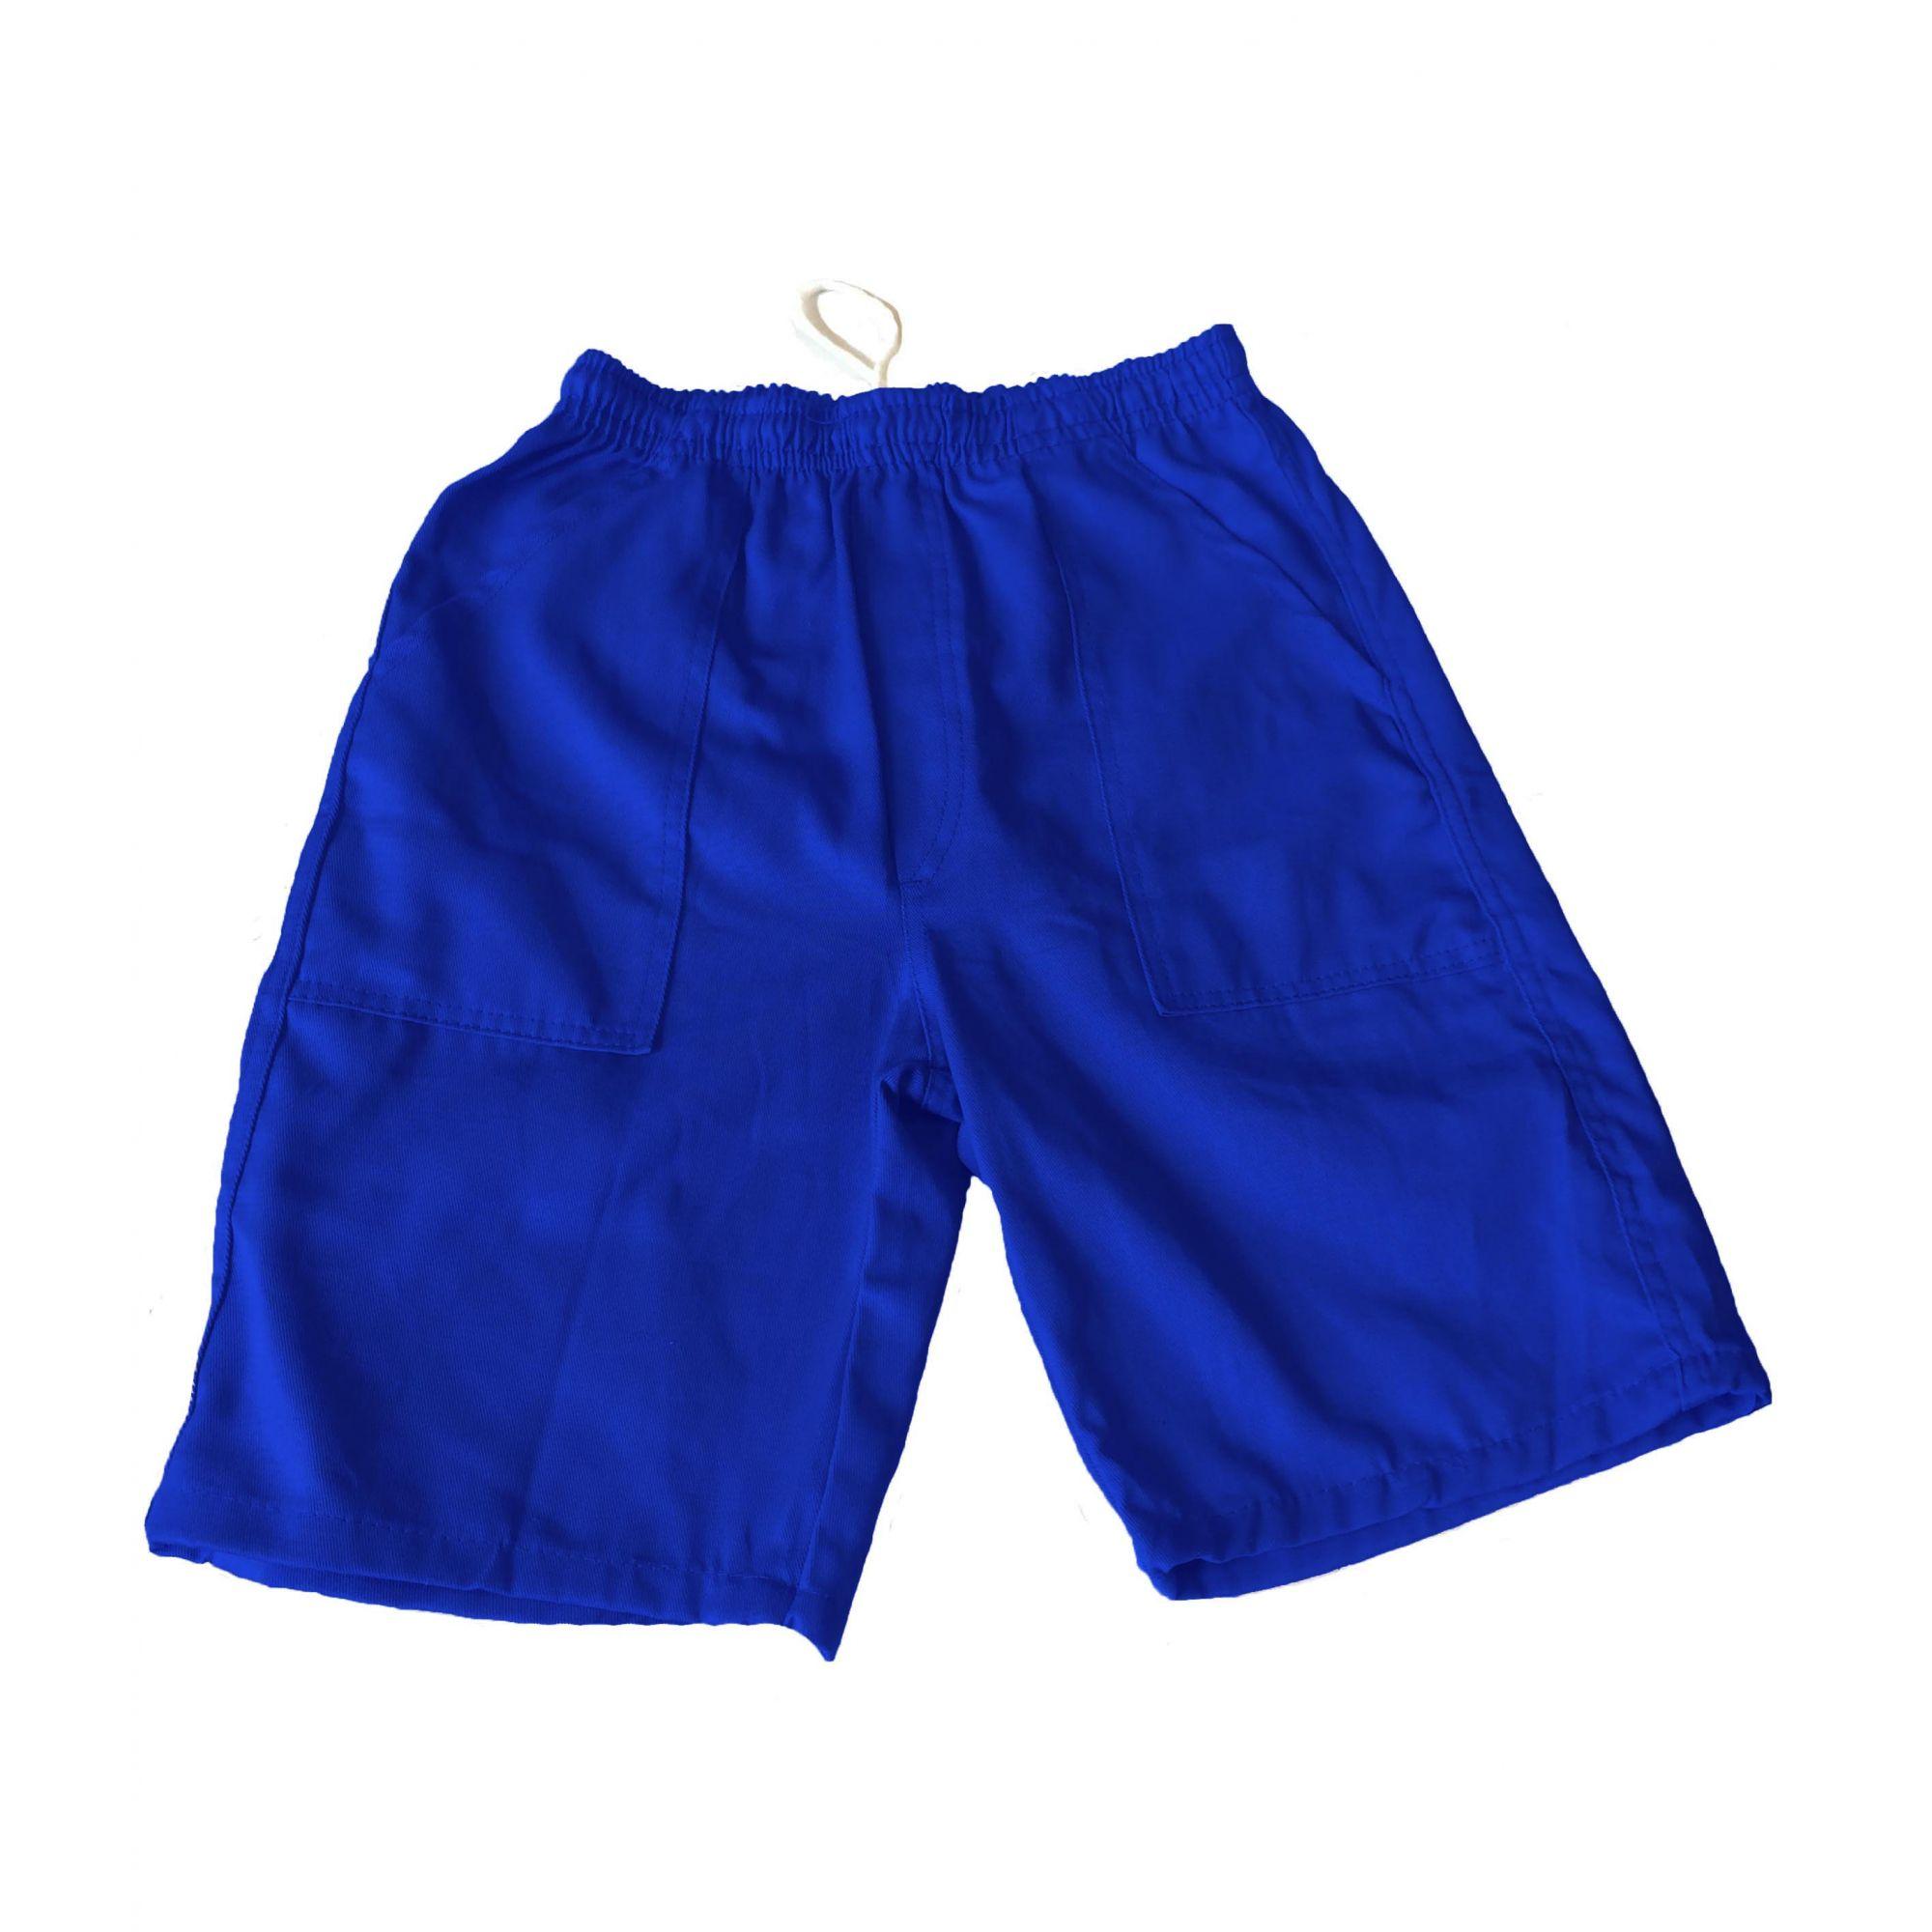 Bermuda Brim Profissional Azul Royal 100% Algodão